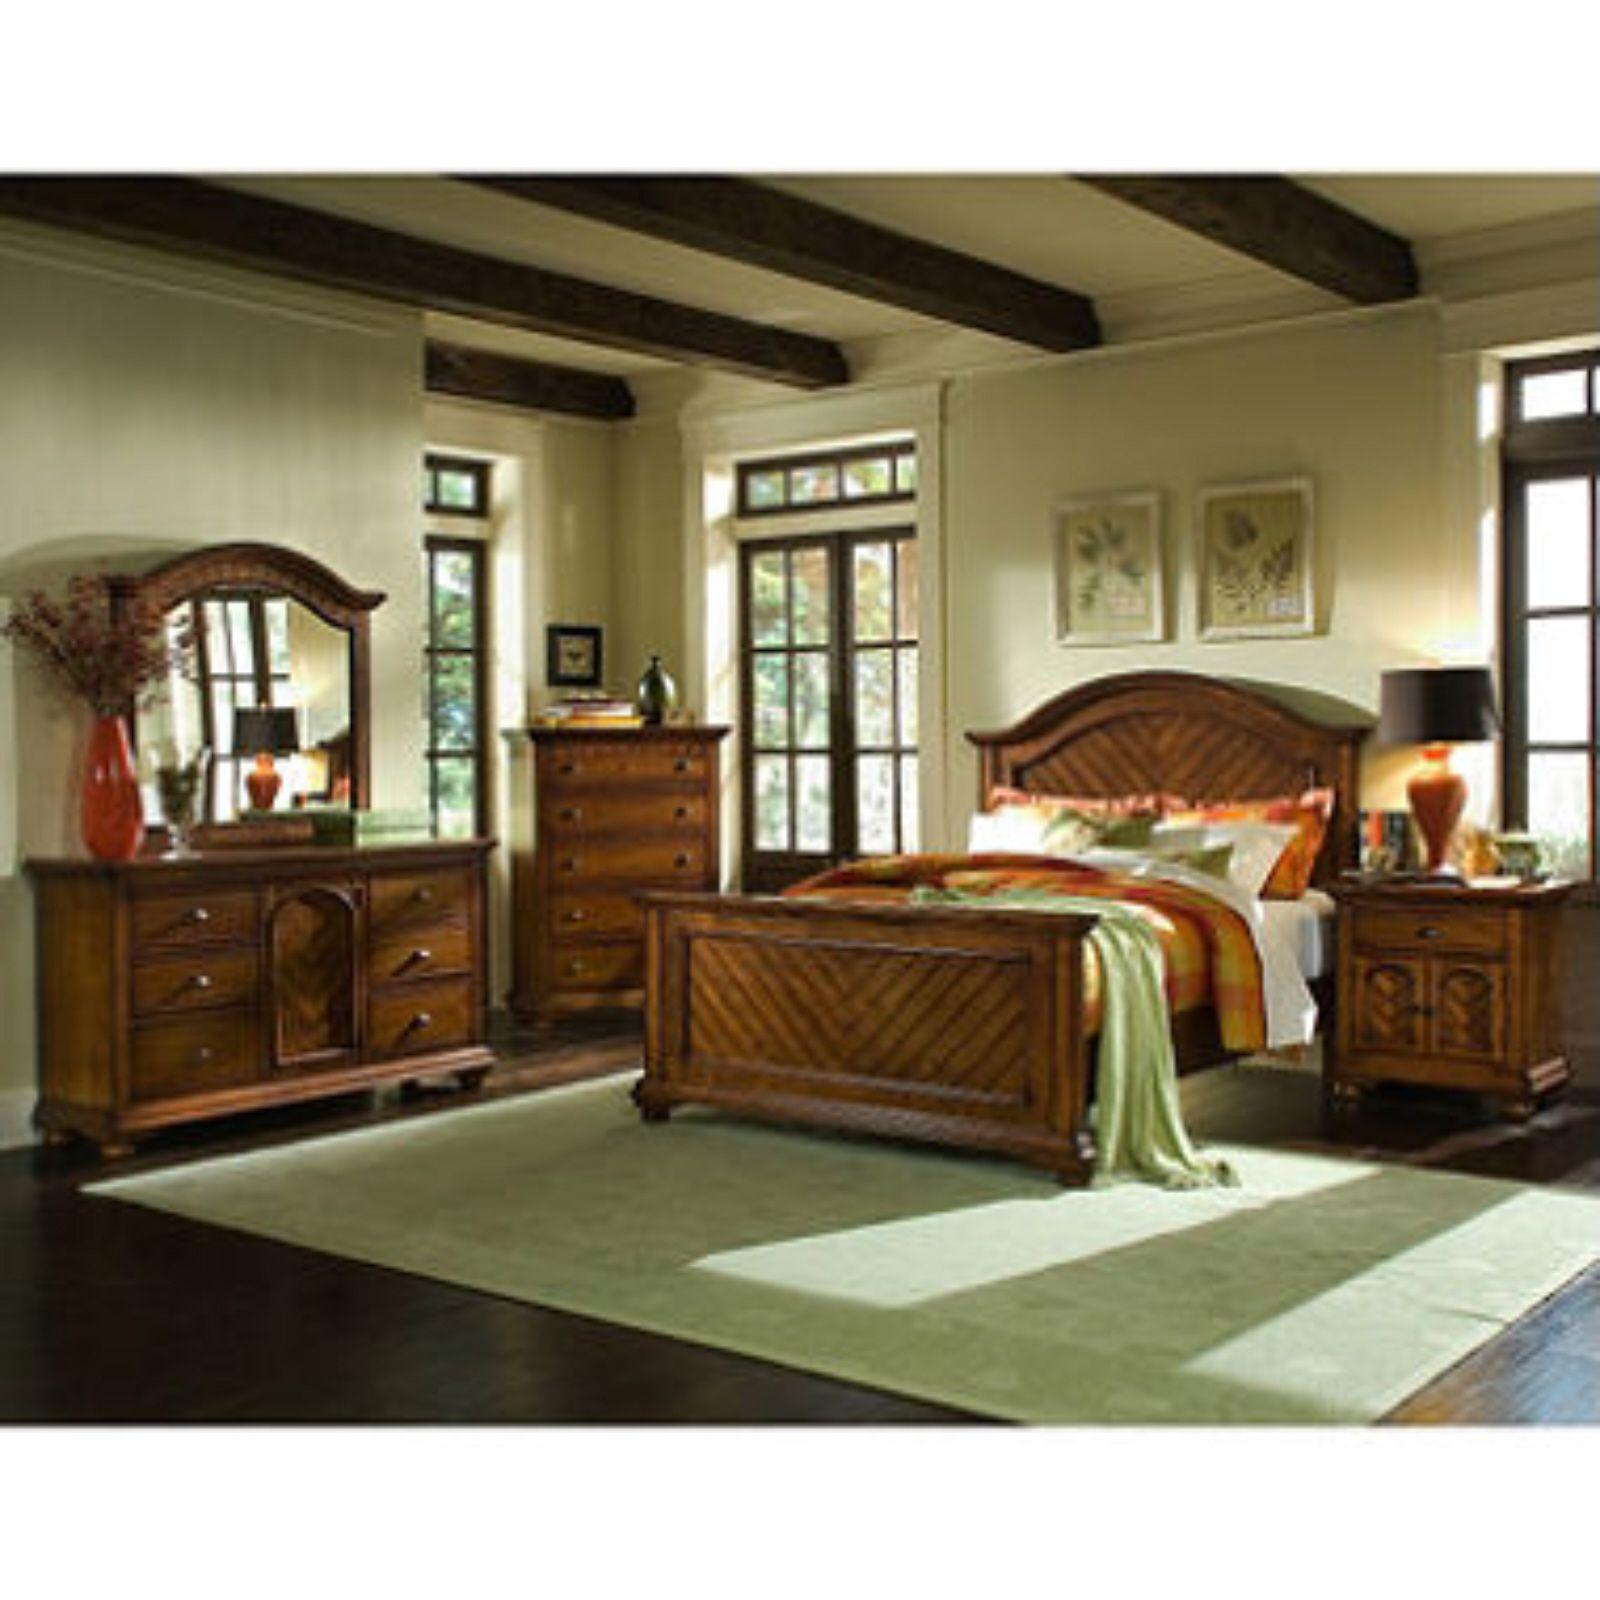 Addison Chestnut Bedroom Set Queen 6 Pc Bedroom Furniture